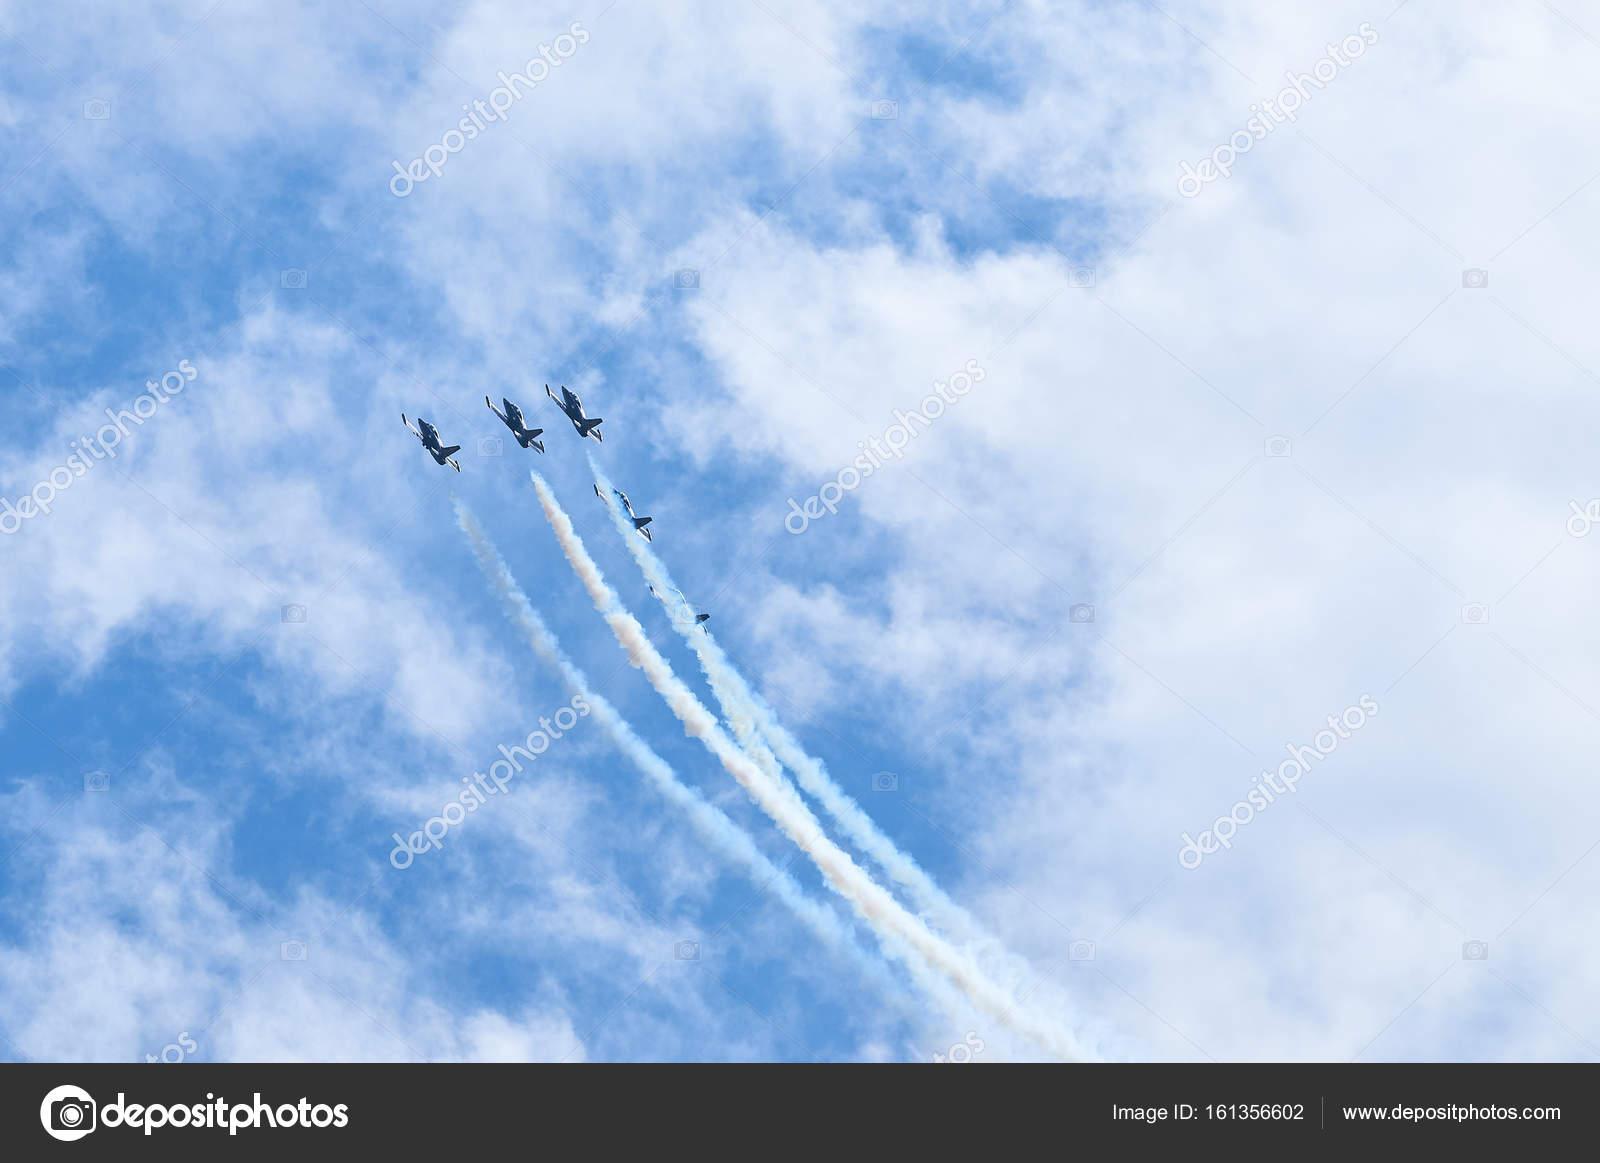 sport planes aerobatic team vapour trails in blue sky plane white vapour trails tracks background